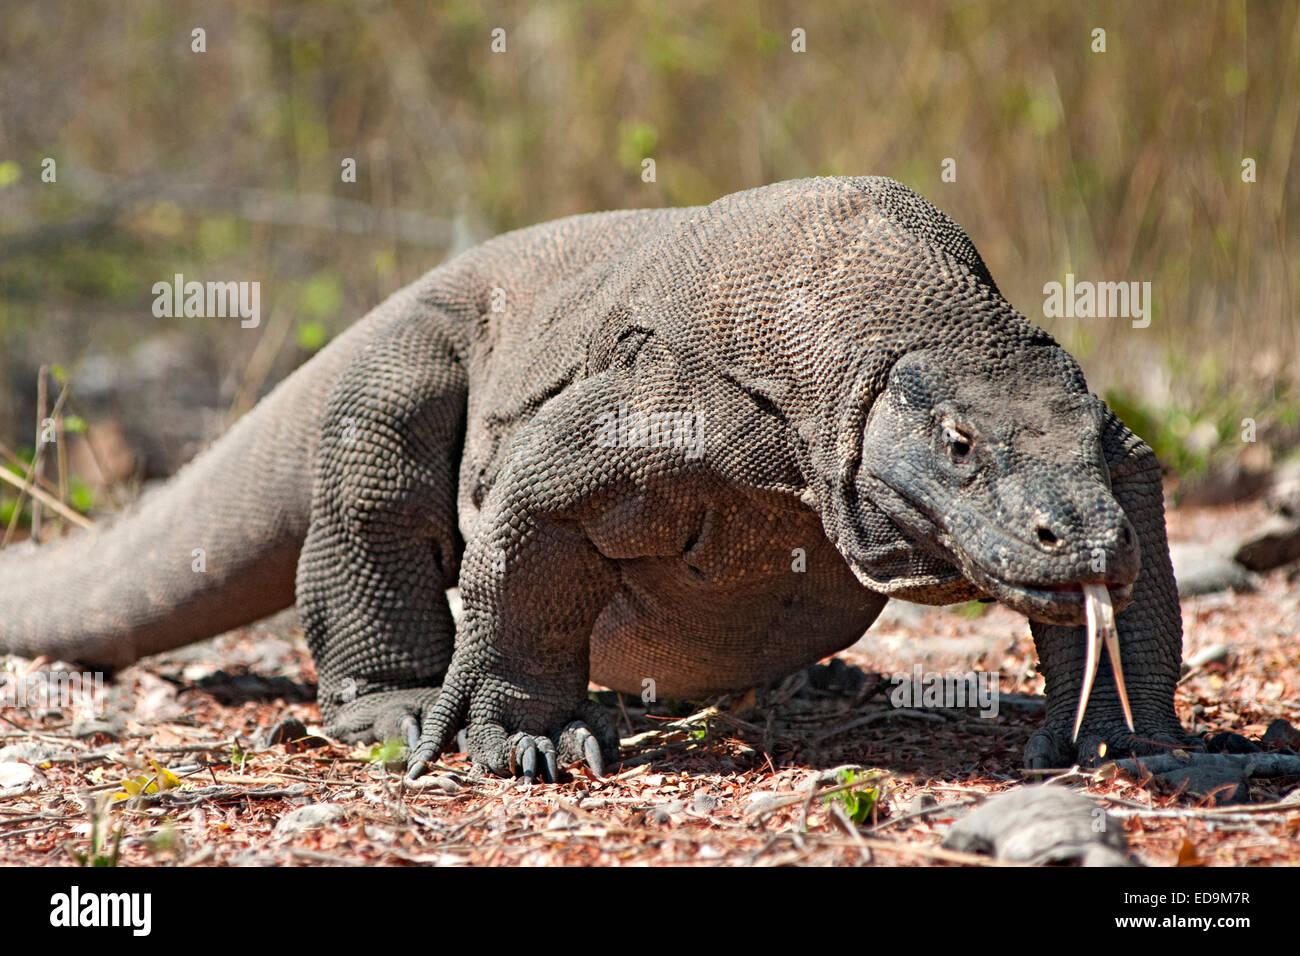 Komodo dragon in the Komodo National Park on Komodo island, East Nusa Tenggara, Indonesia. - Stock Image